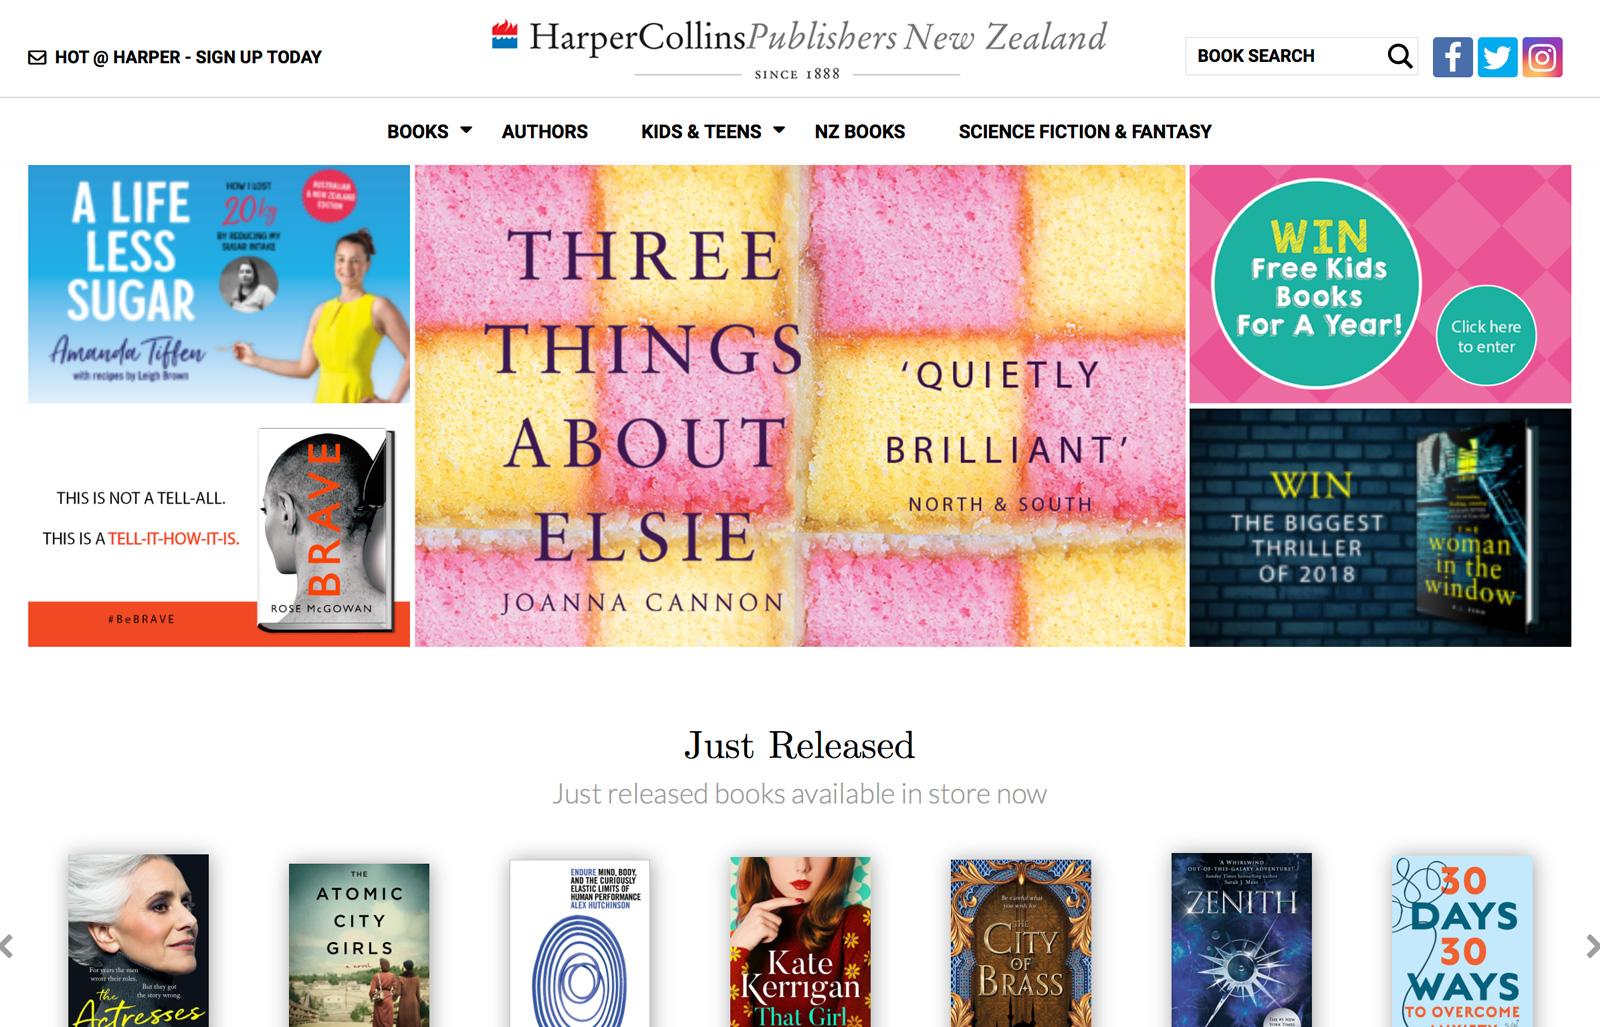 HarperCollins New Zealand launches new site using market leader Supadu